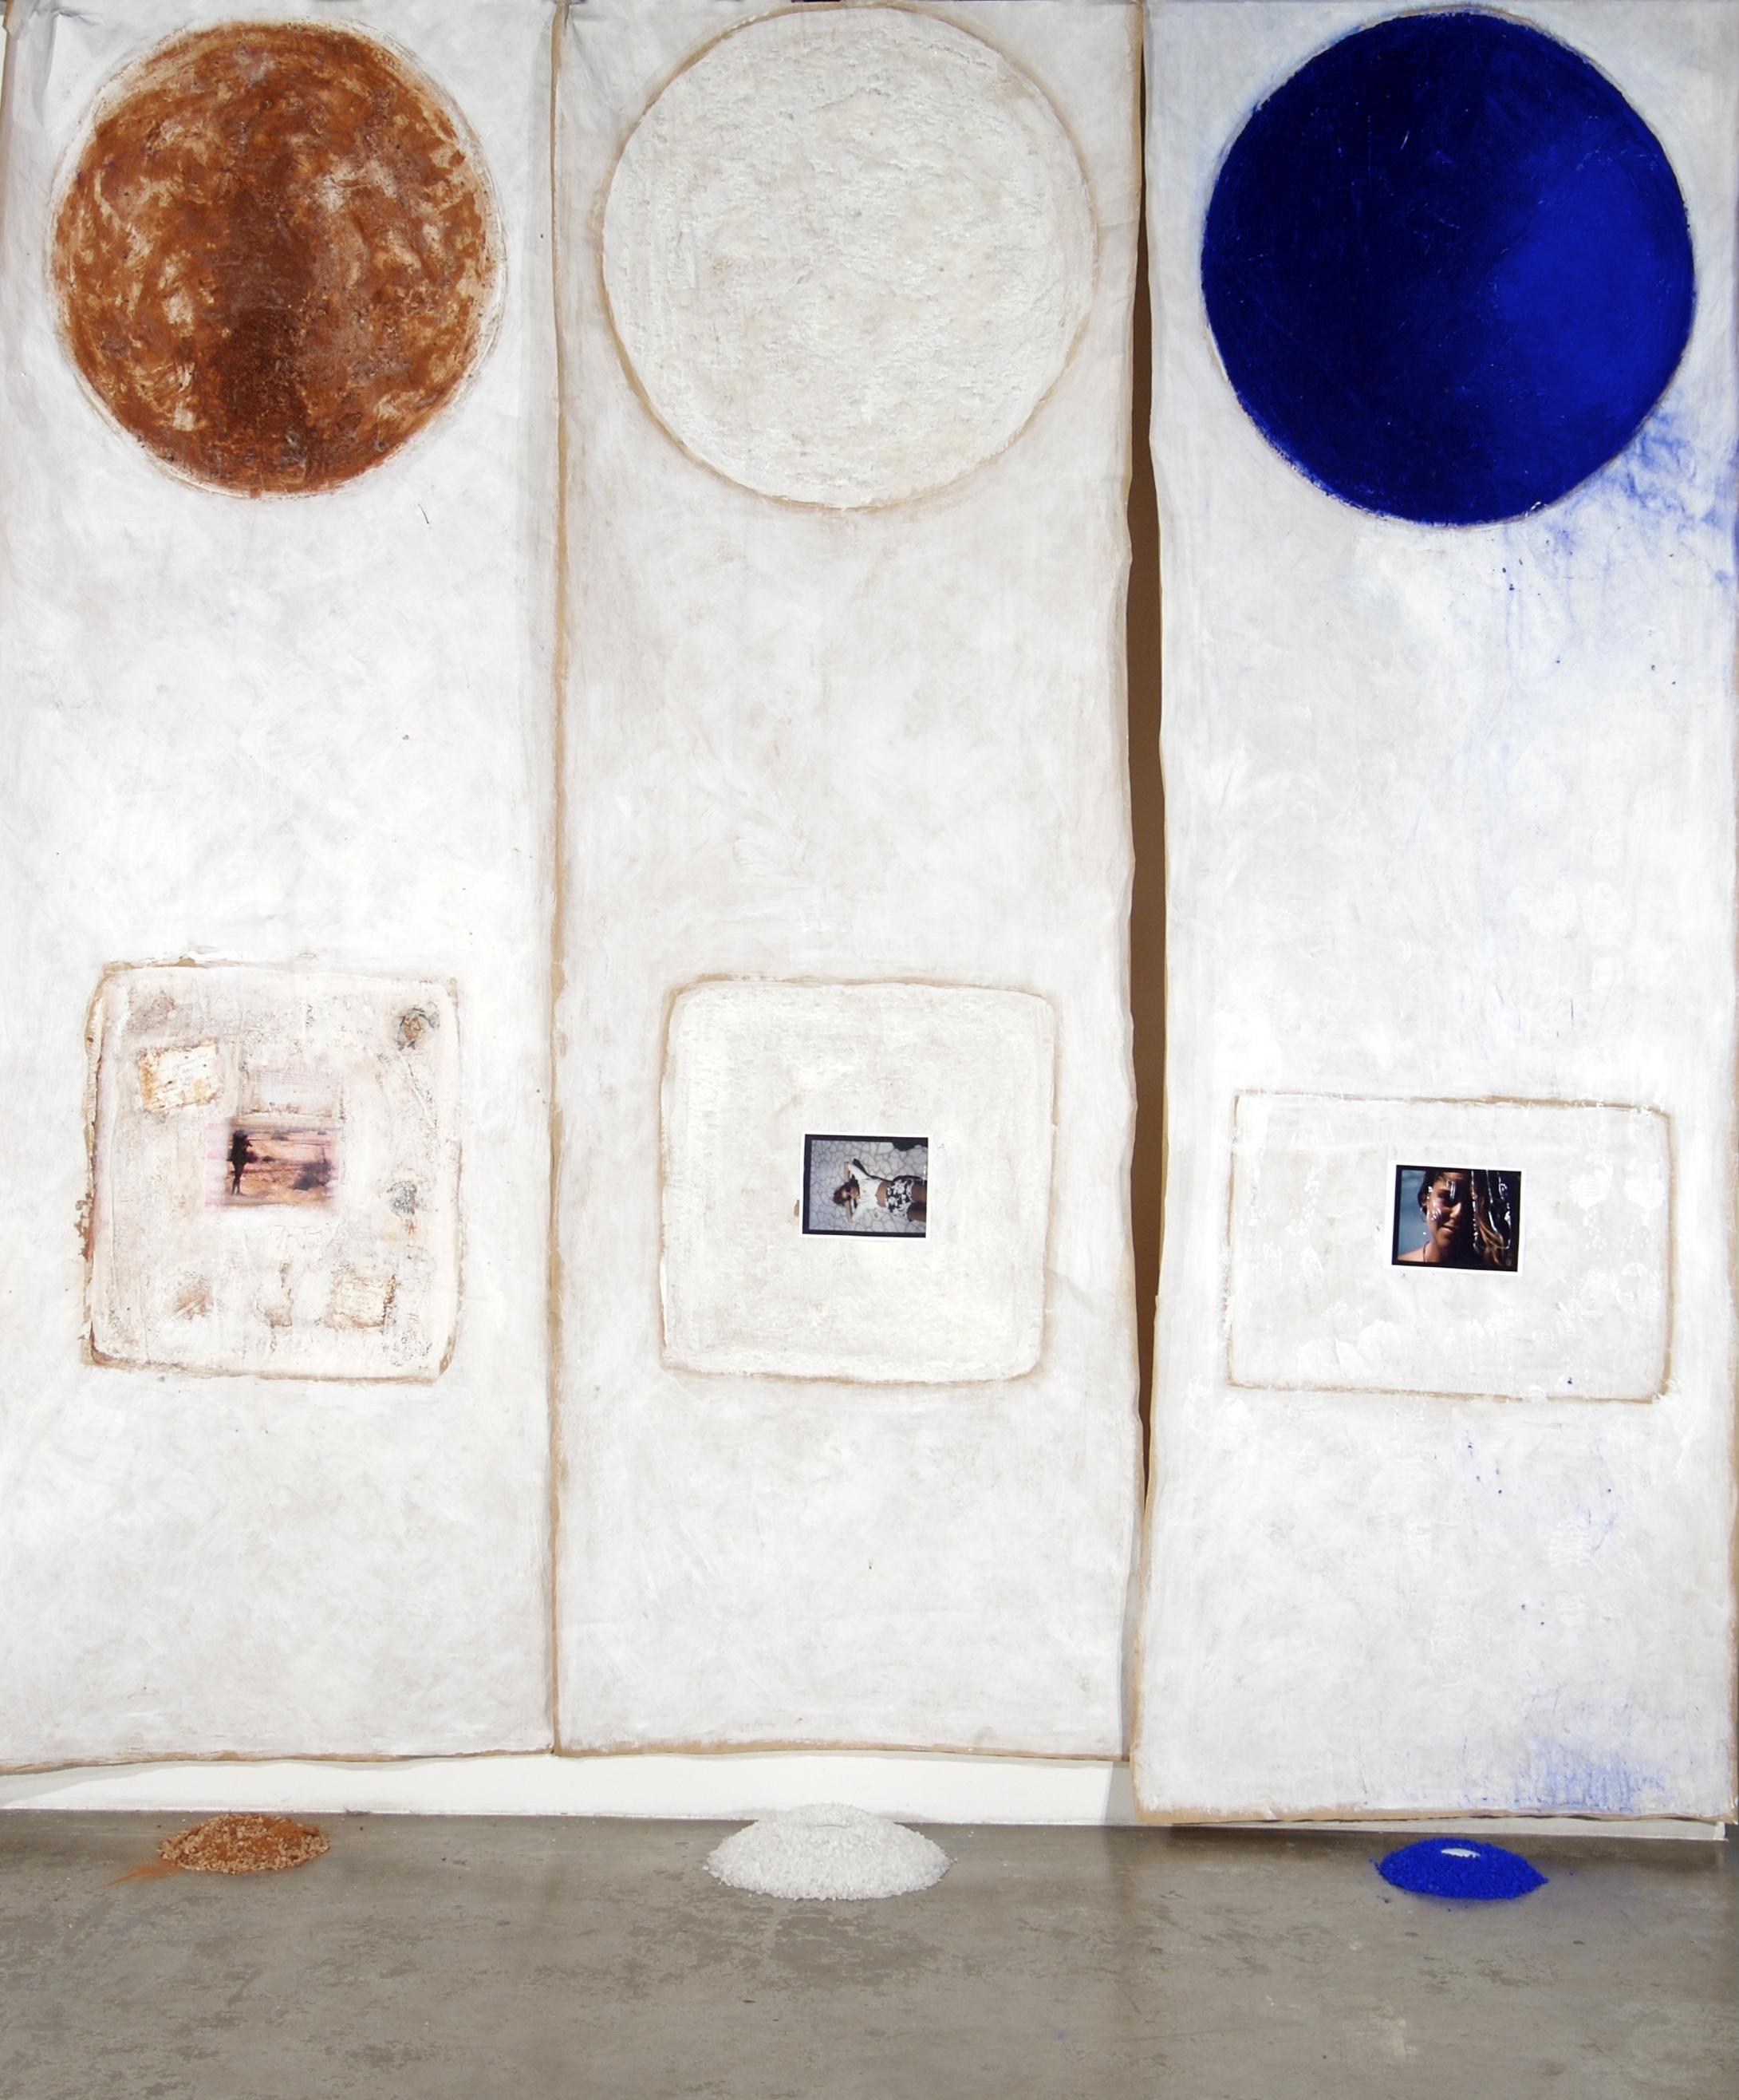 3 Luigia Martelloni %22The Journey, Earth,Salt, Sky%22.jpg